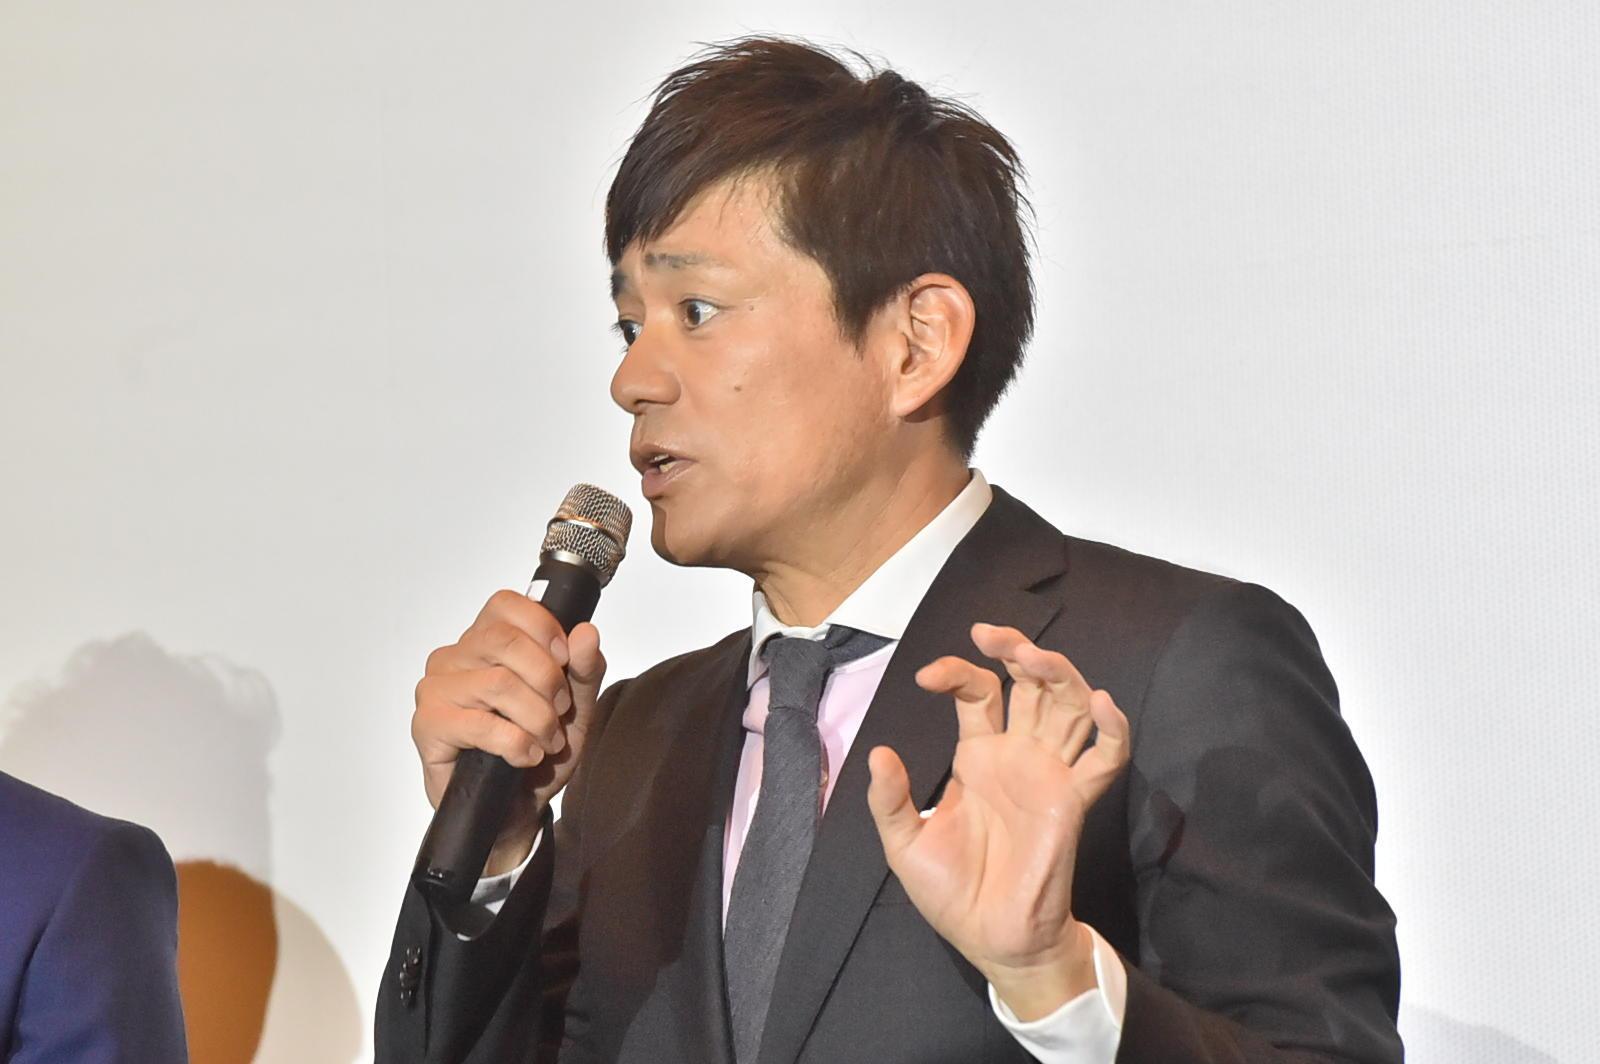 http://news.yoshimoto.co.jp/20190115125531-5989451c55b6923d5b1a389e53e7513ee7429434.jpg